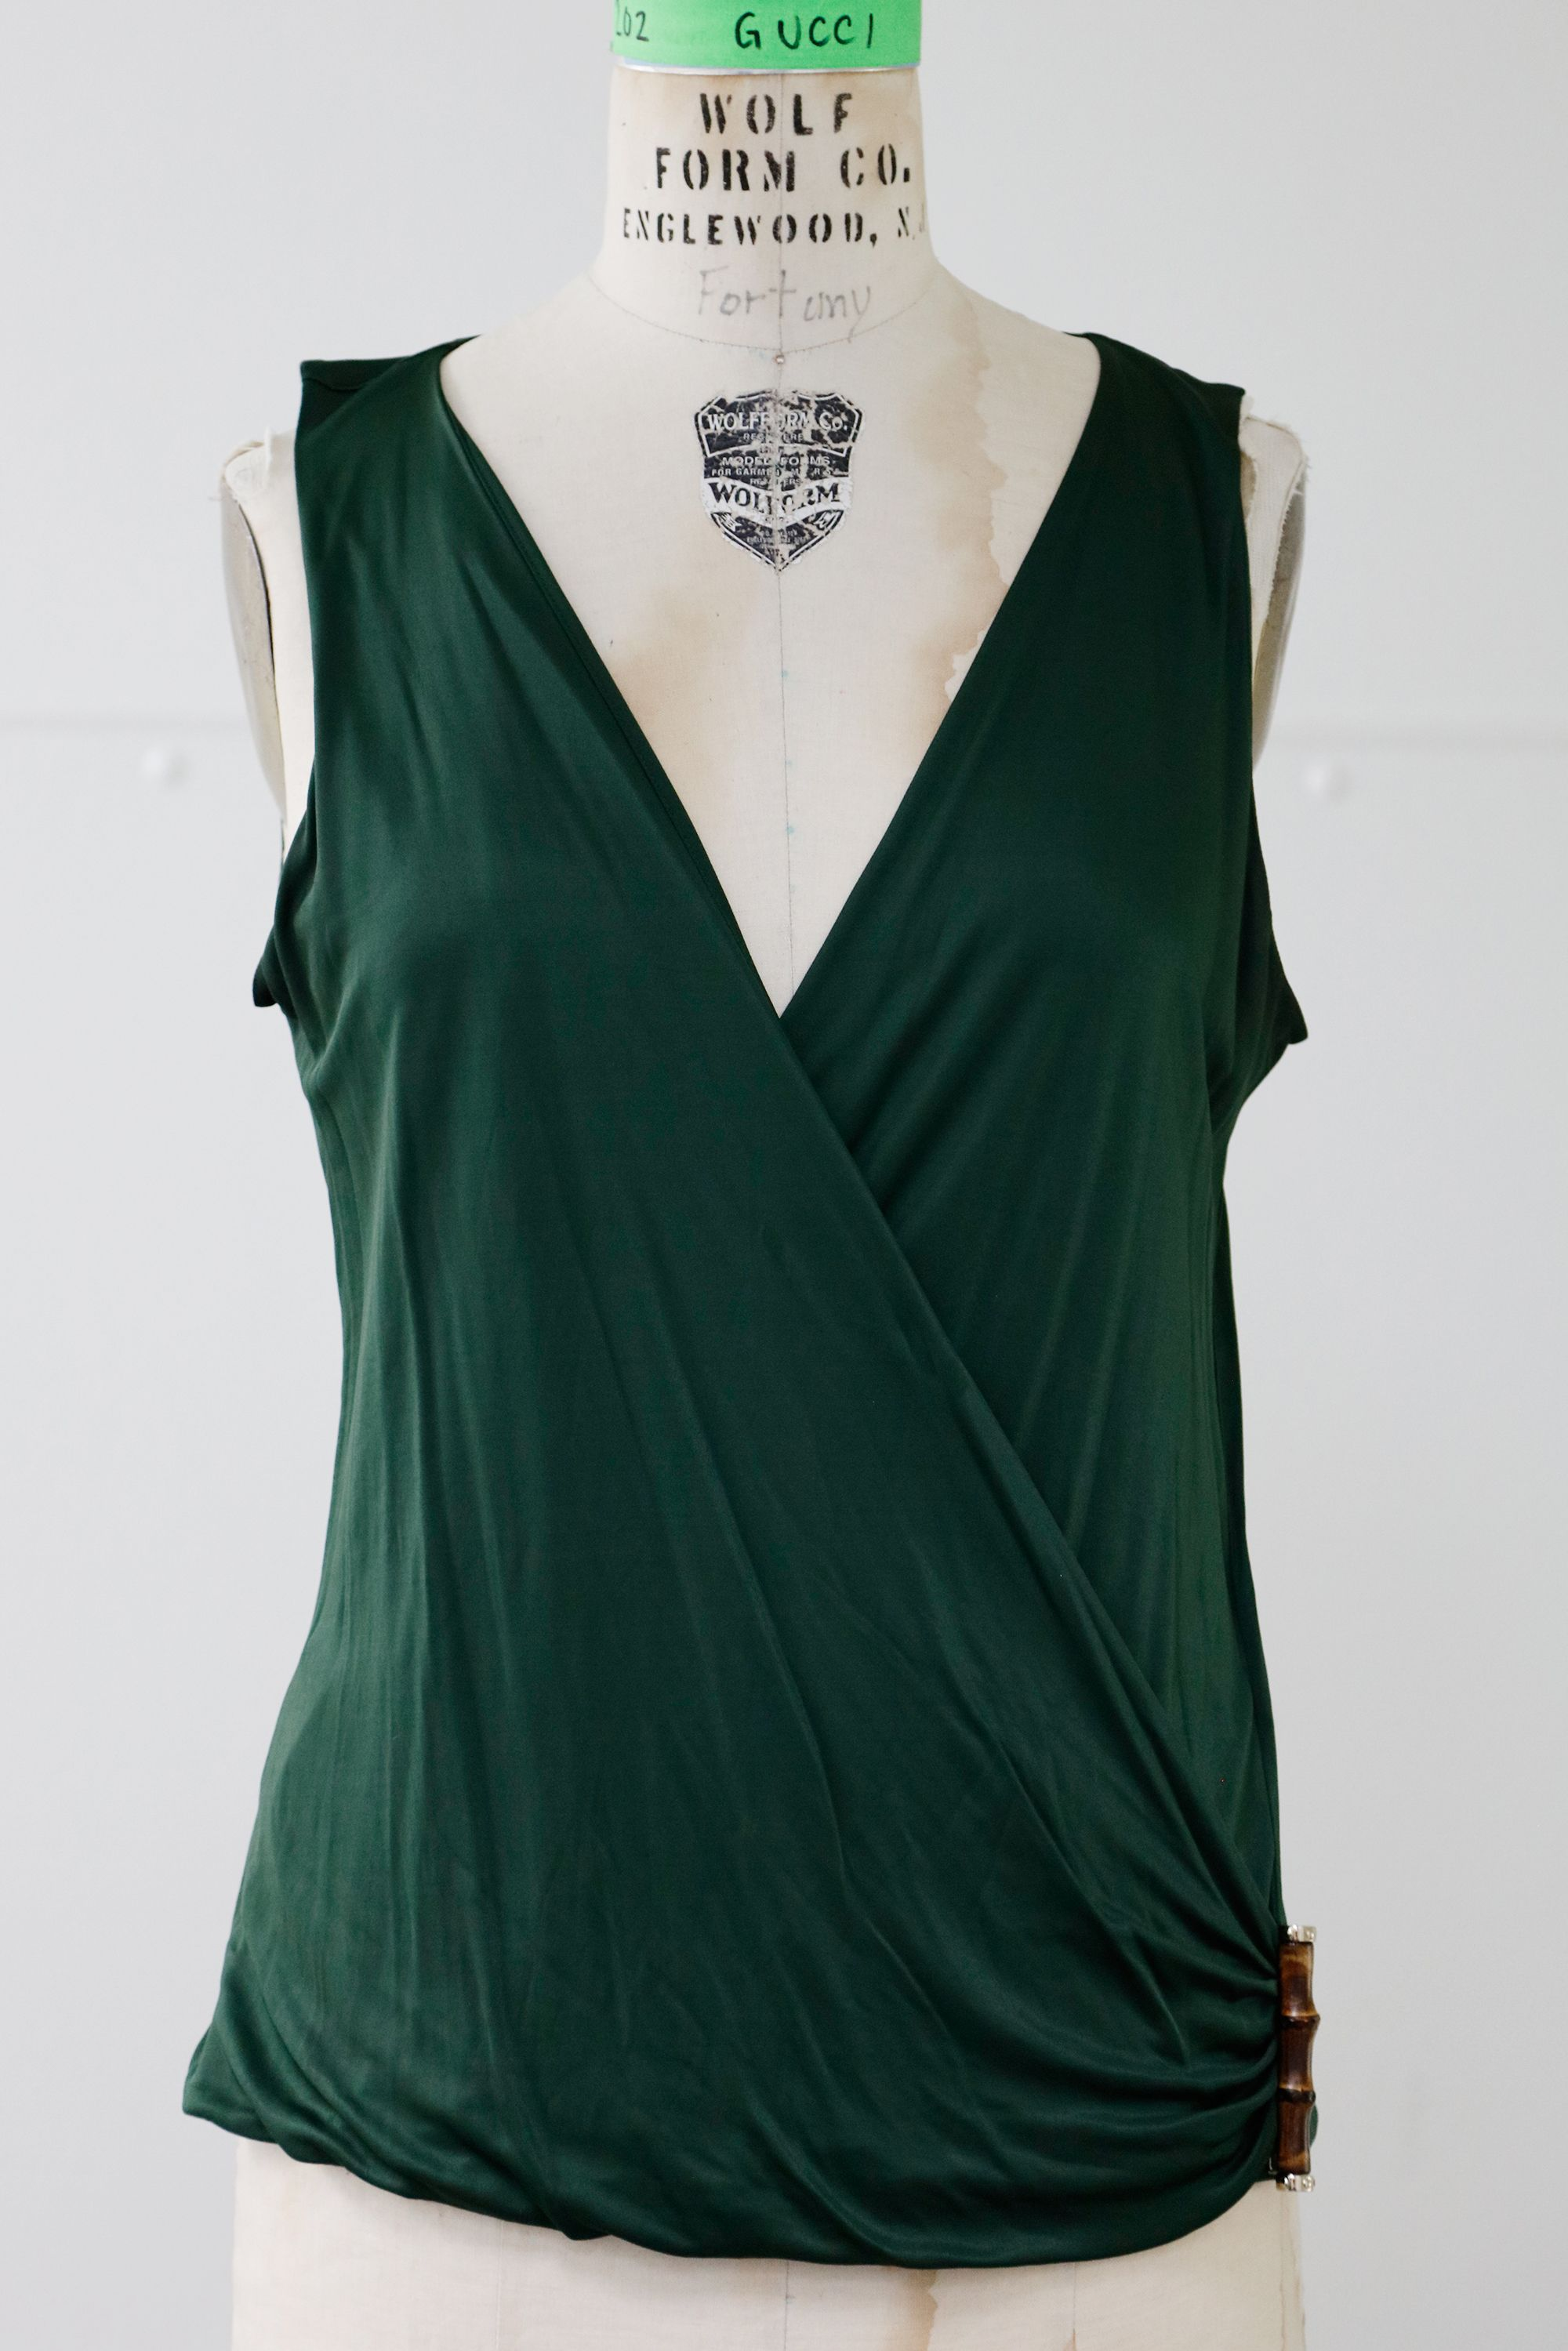 183e8e88f UPPER LEVEL Gucci Forest Green Sleeveless Top #W62500130 | Tops ...